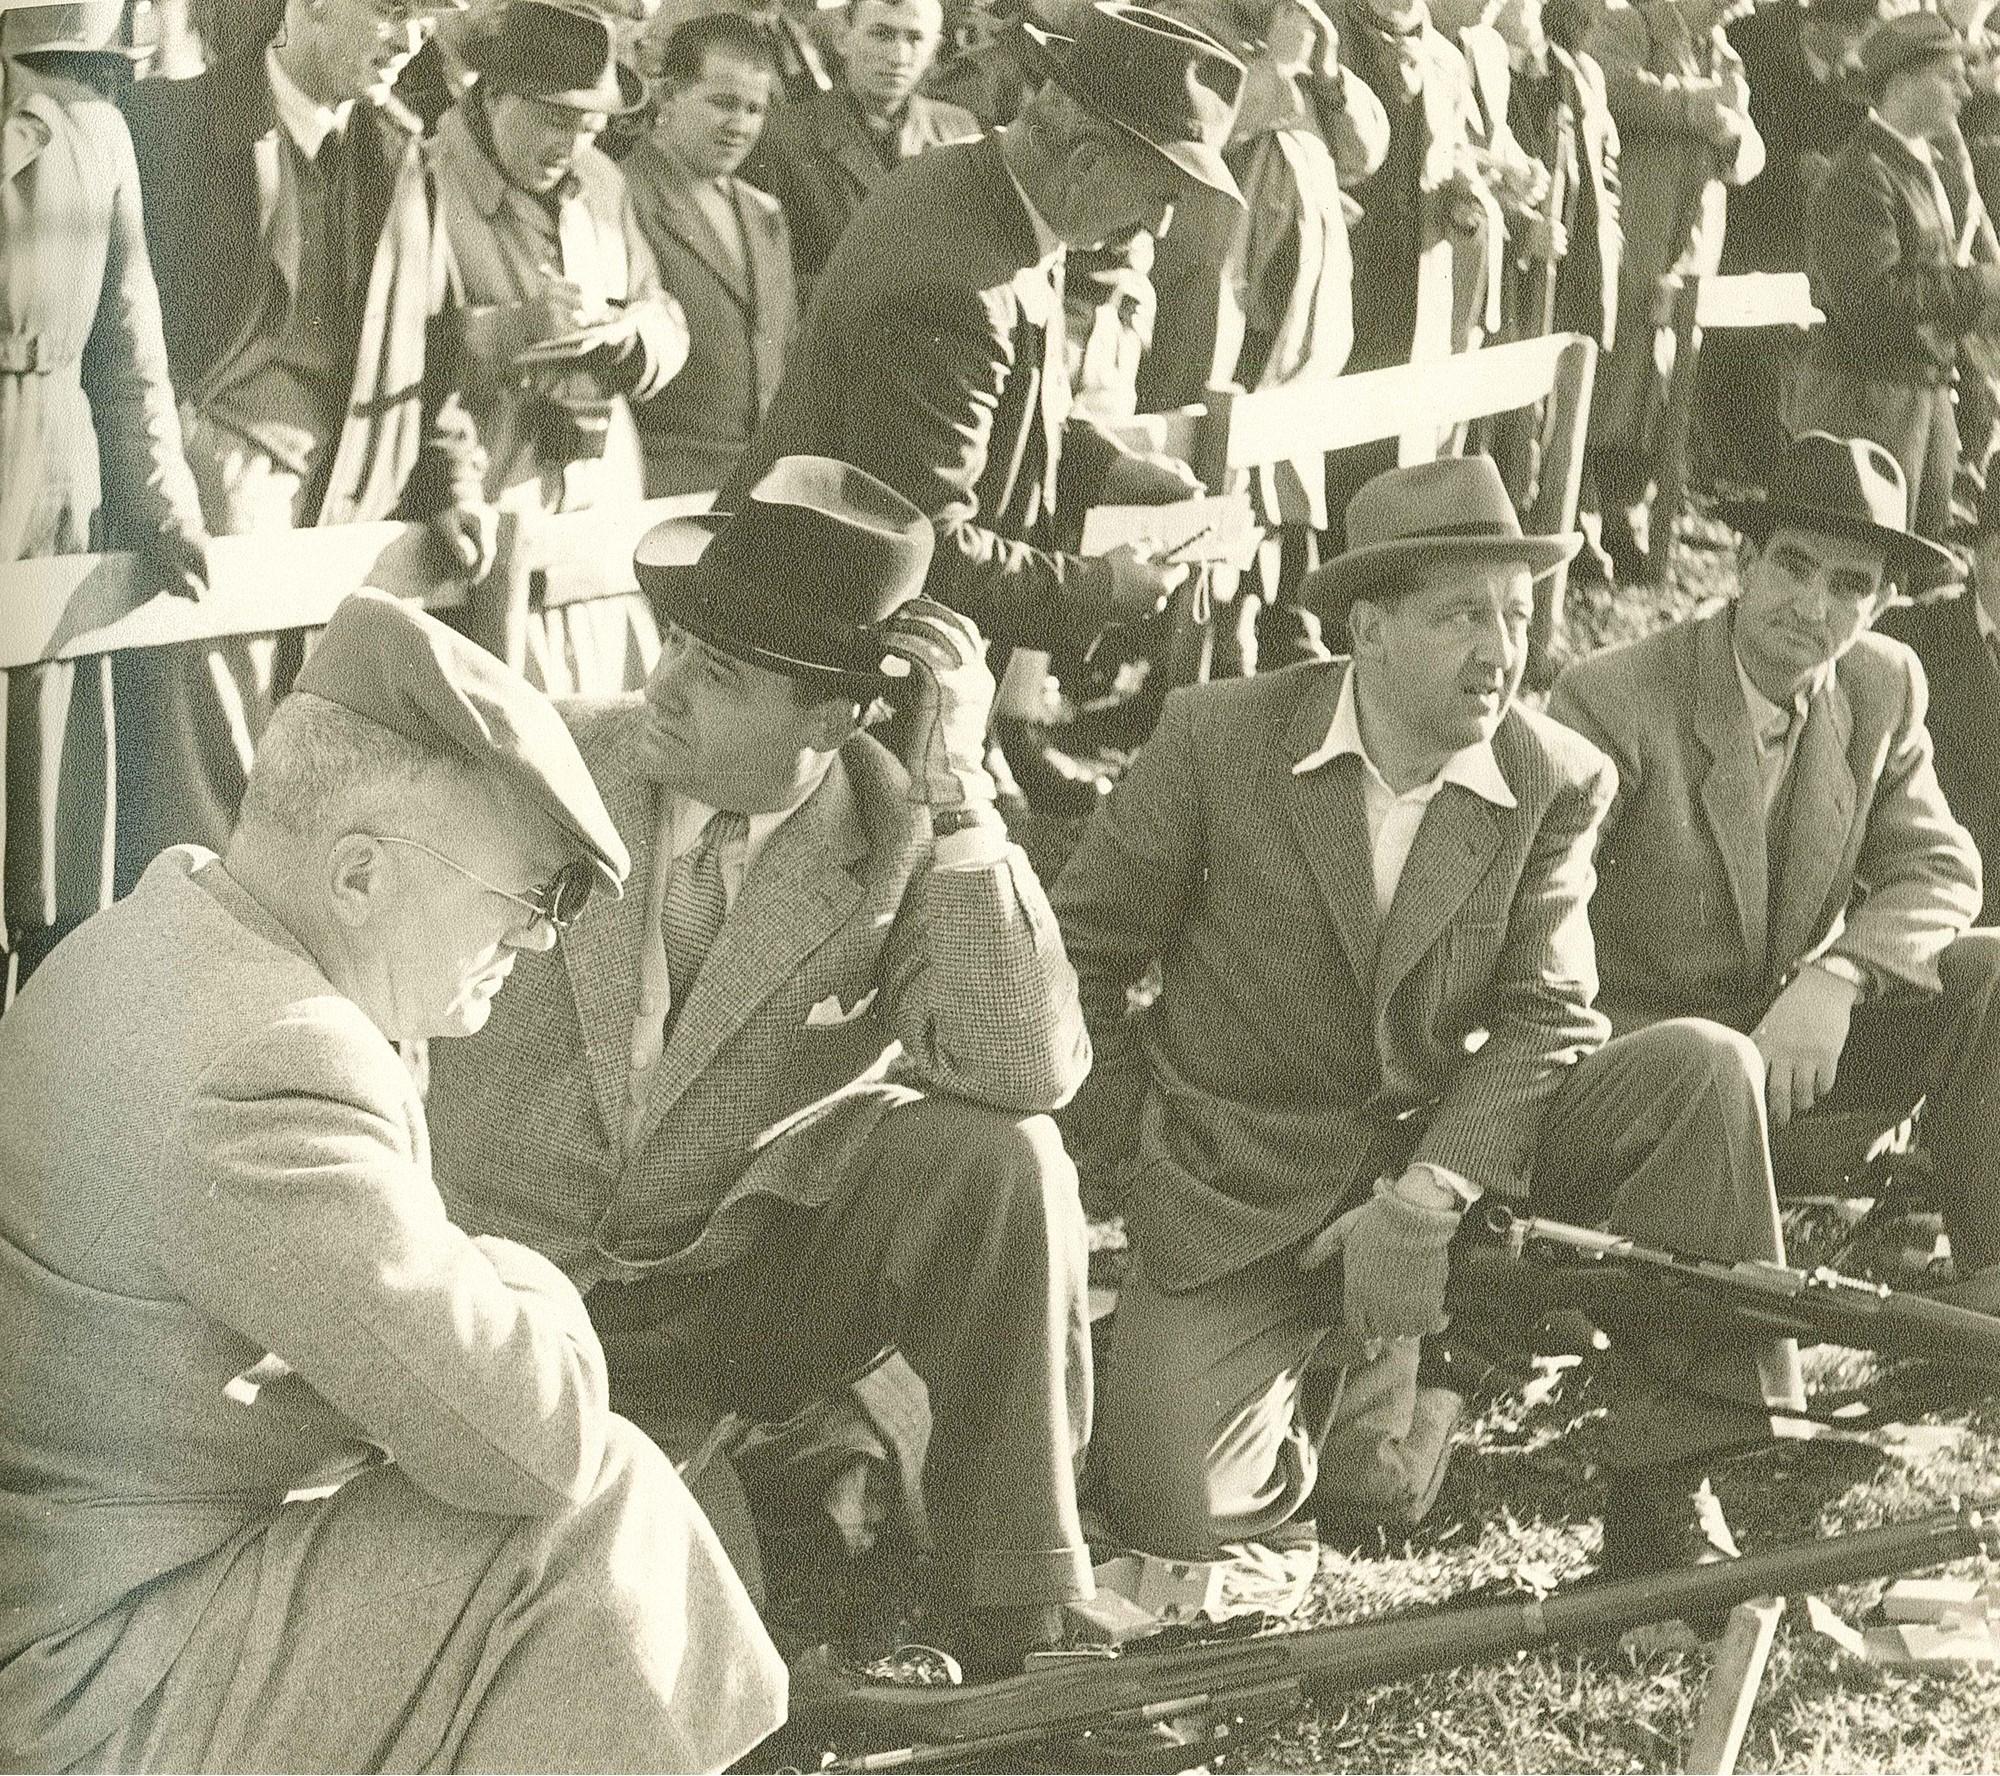 Rütli 1952 v.l. Dr. Franz Huber, Kurt Girard, Rudolf Bürgin, Dr. Hermann Achten